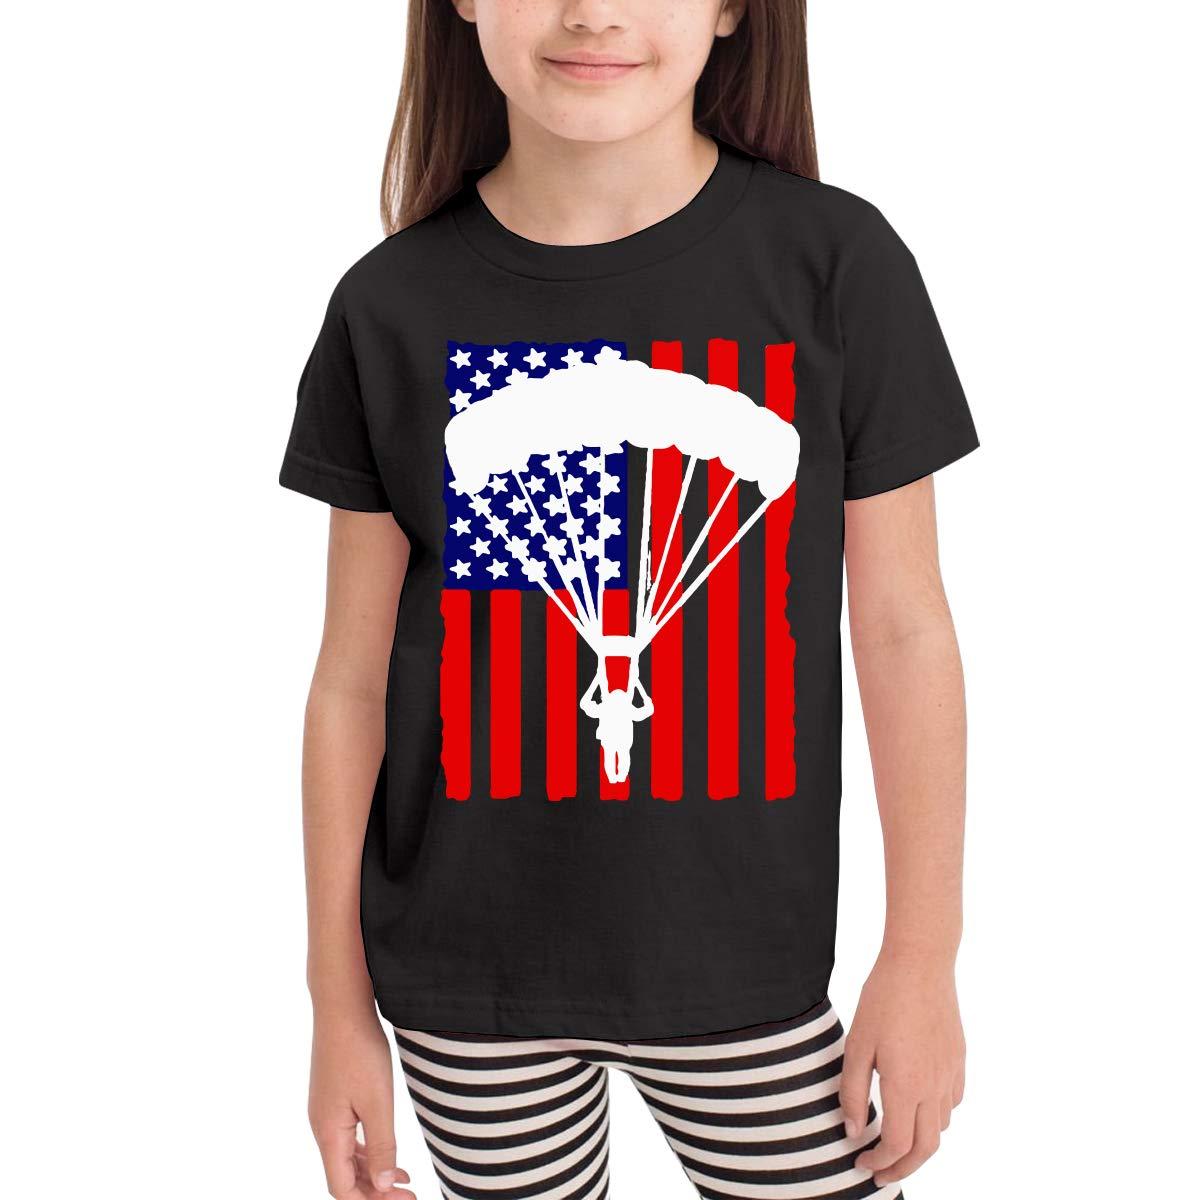 Baby Boys Kids American Parachuting Skydiving USA Flag Soft Short Sleeve Tee Tops Size 2-6